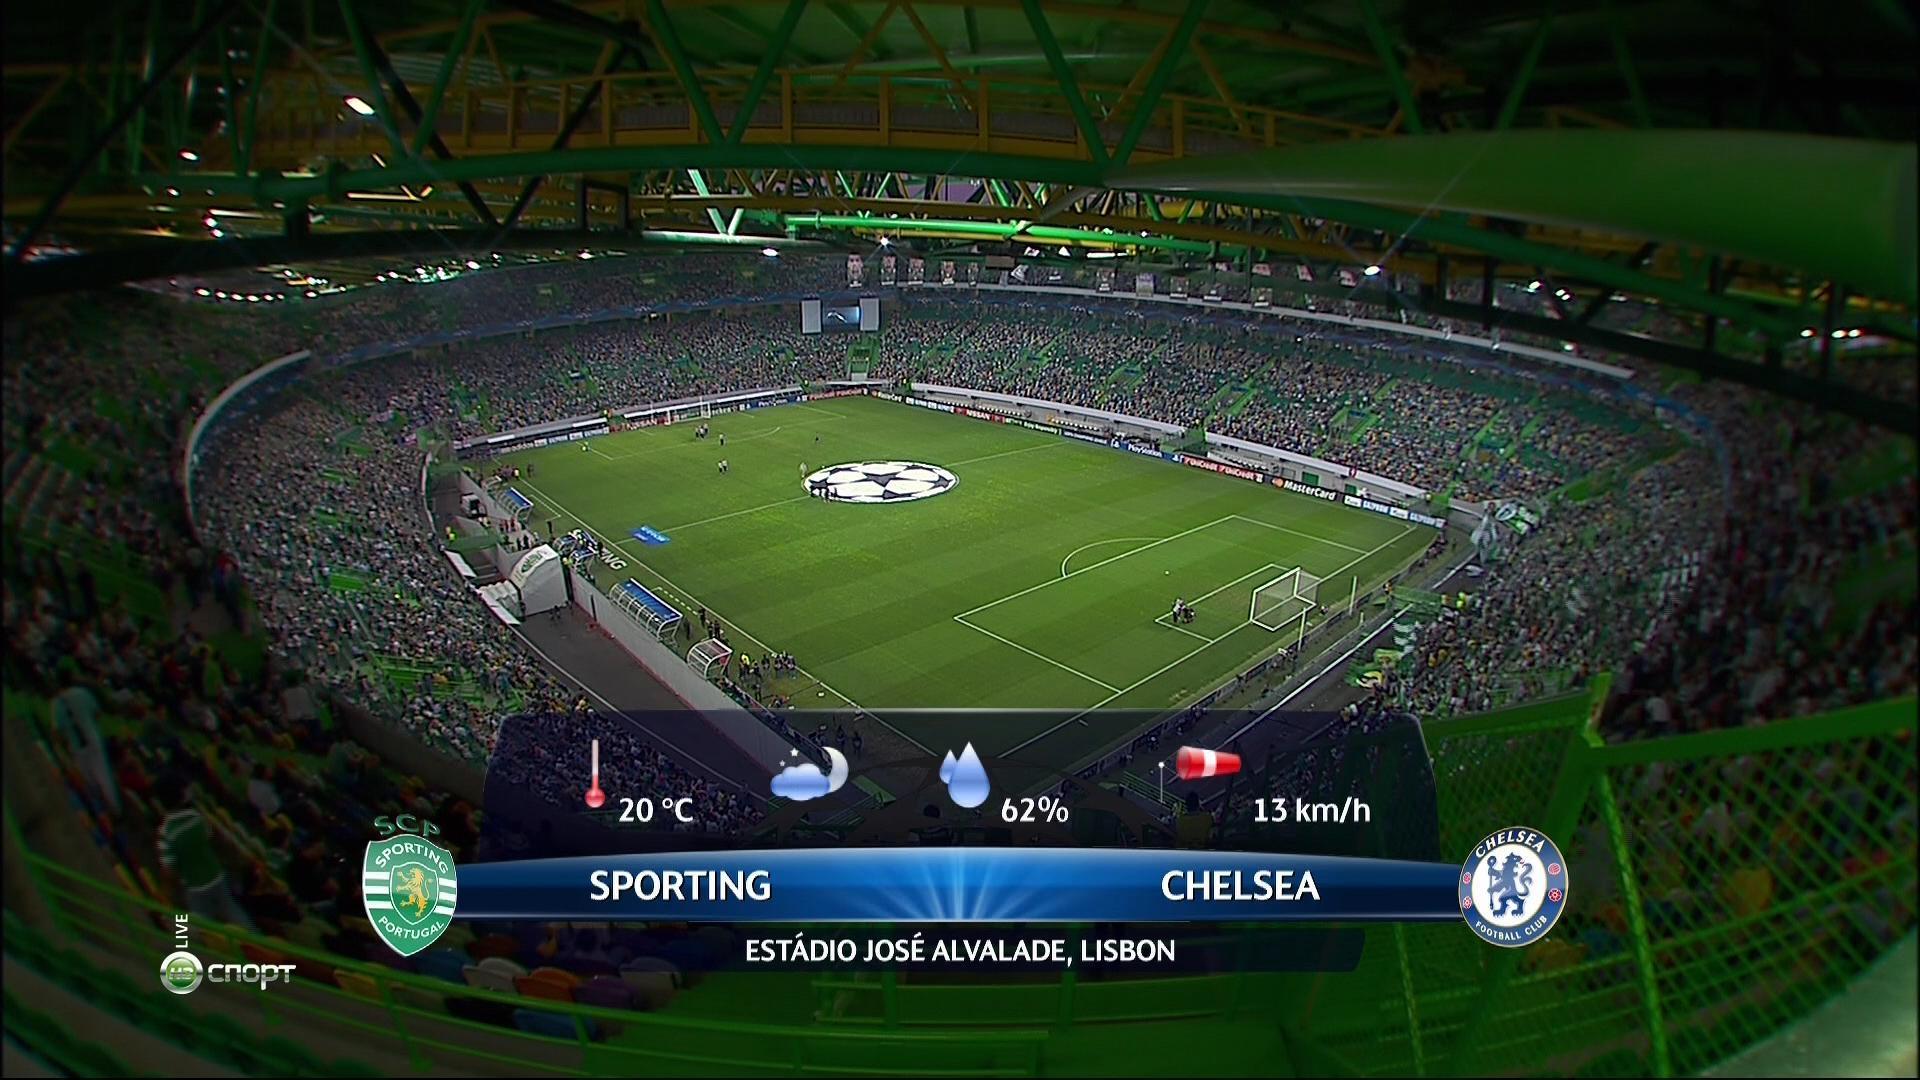 прогноз футбола лига чемпионов спортинг-челси 30 сентября